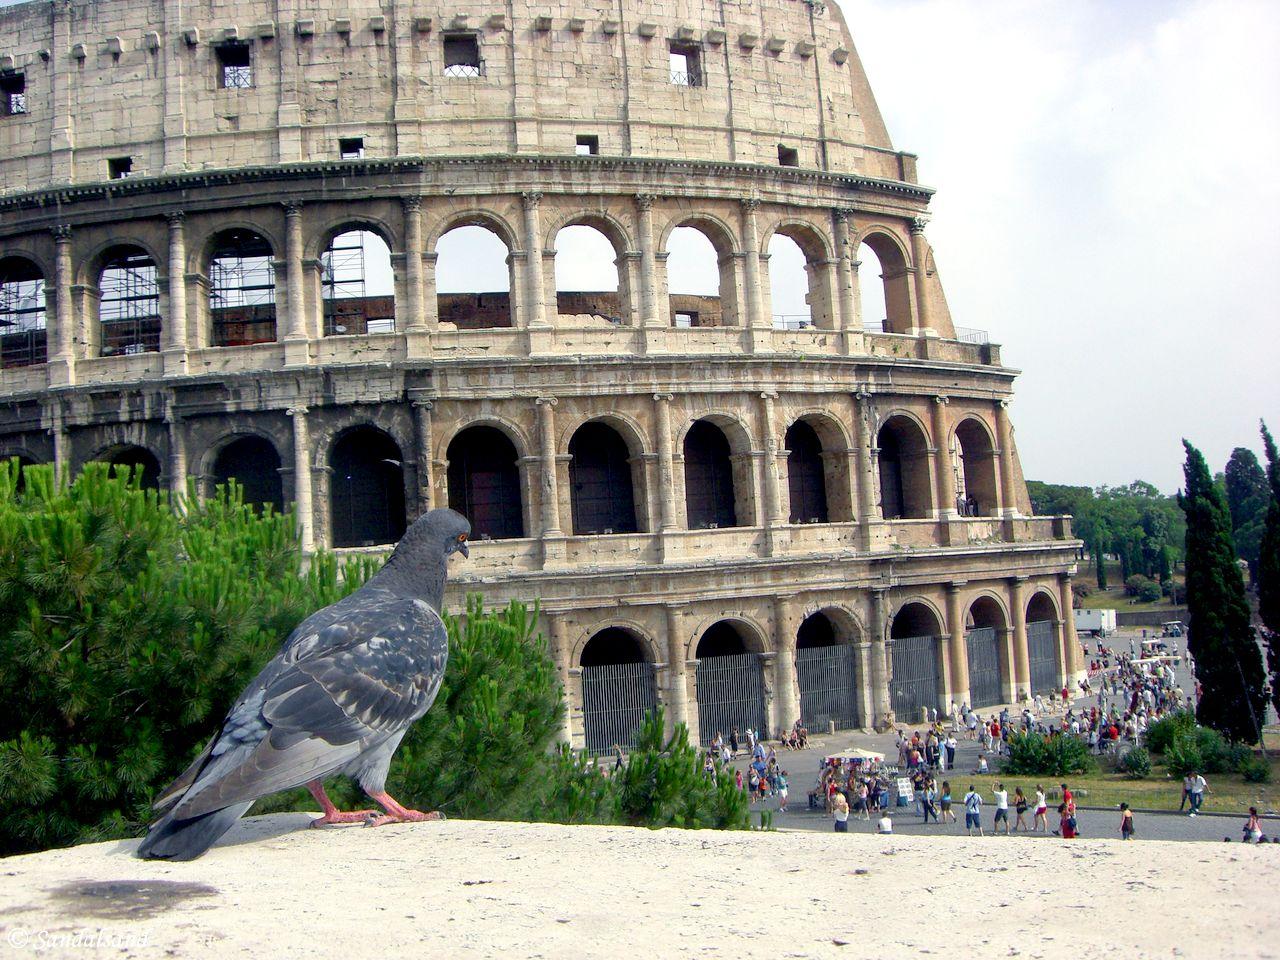 Italy - Roma - Collosseum